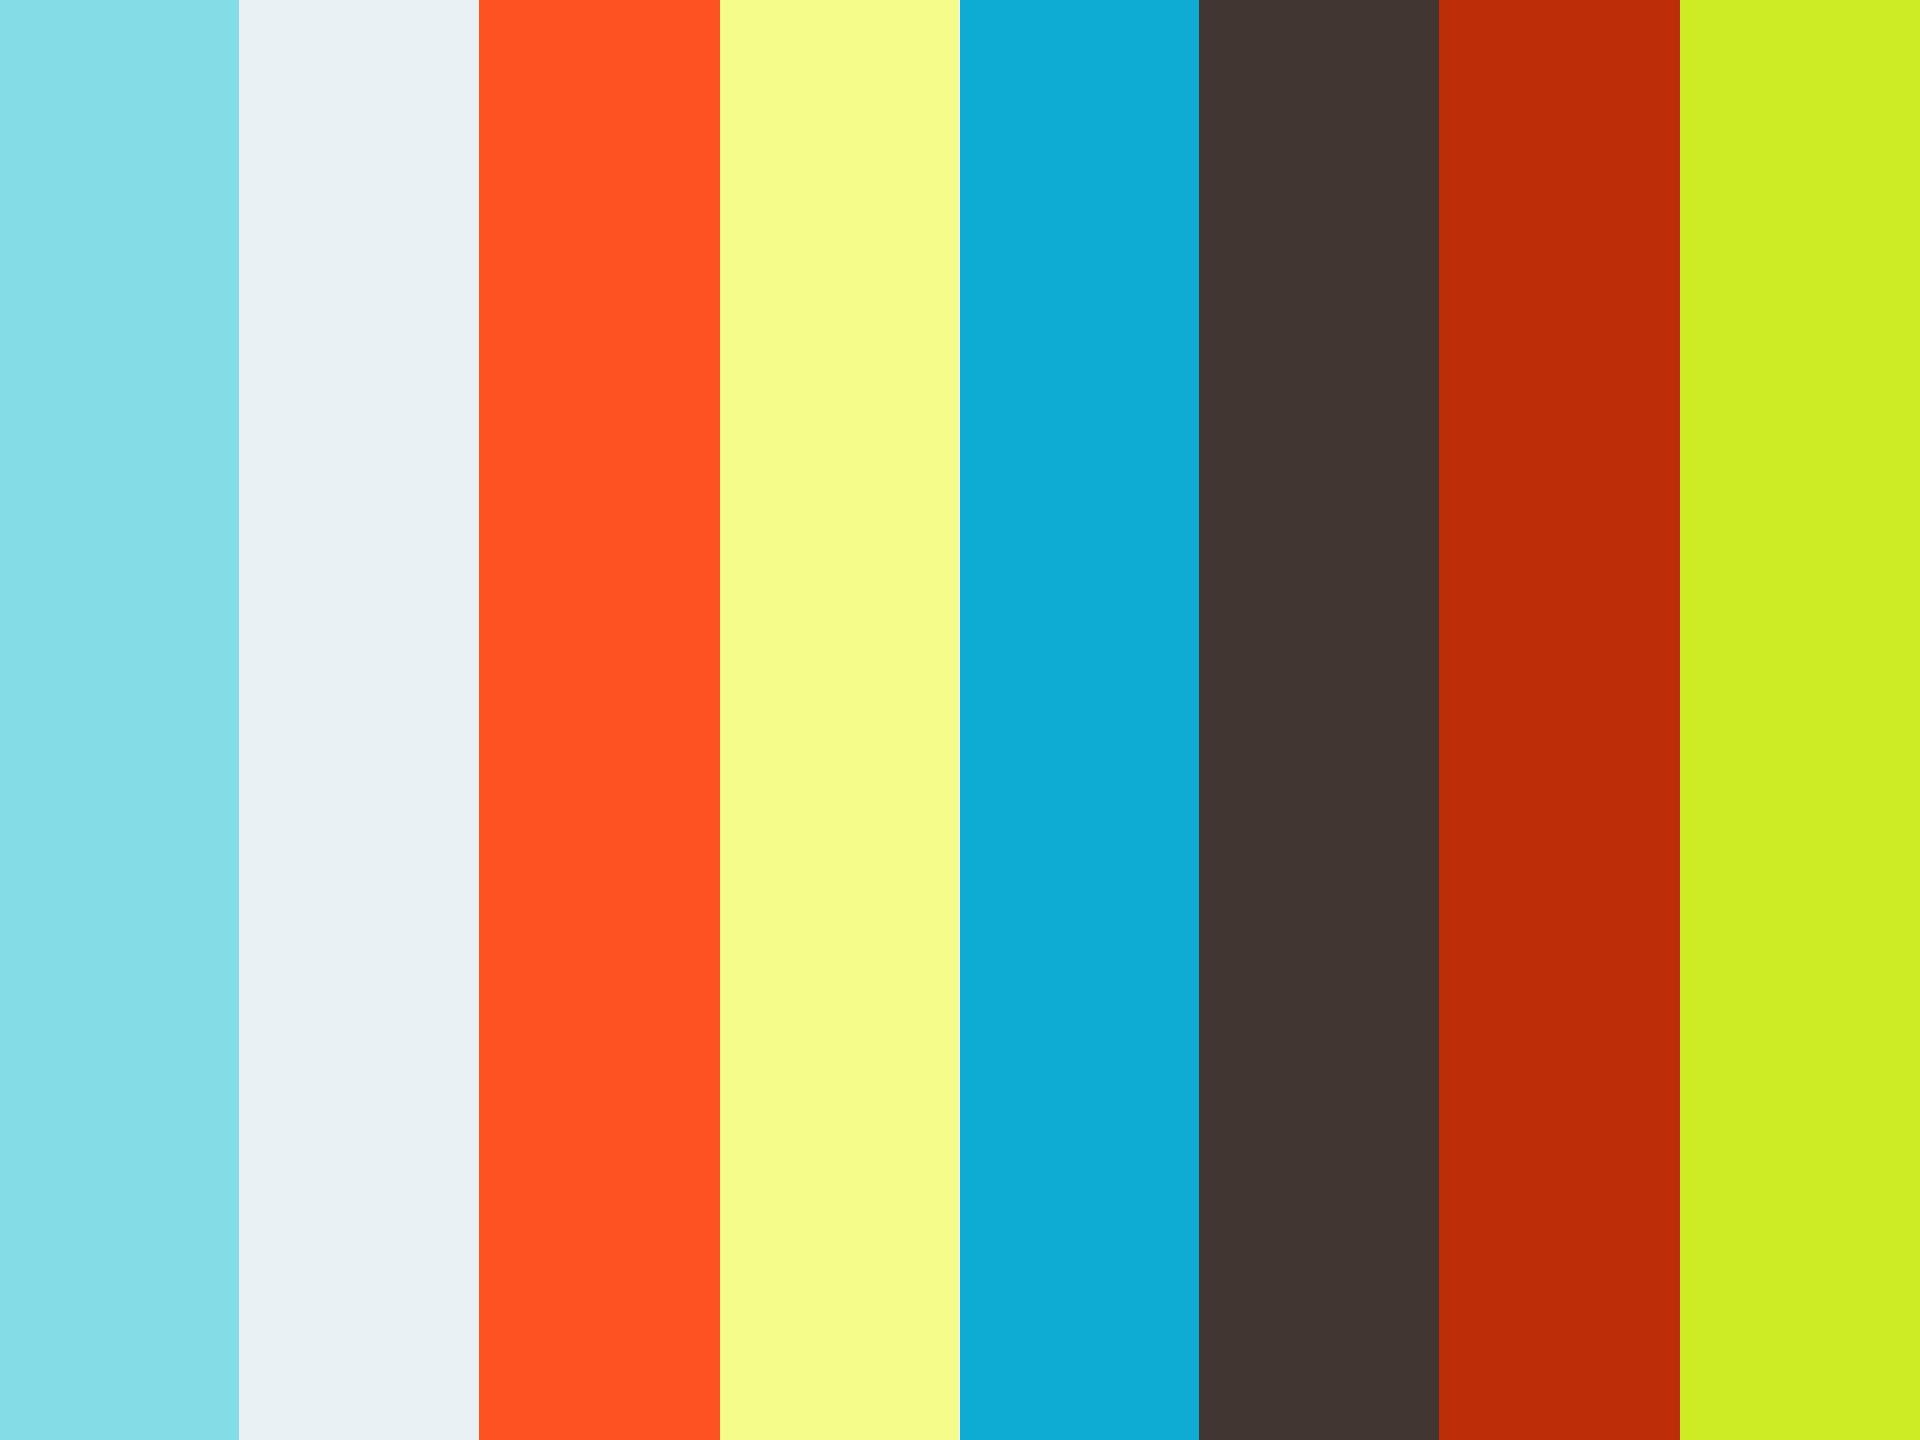 AITOR SORINAS-ADRIAN  BURGOS (MONITORES CAMPUS RIVER MONZÓN VERANO 2021)